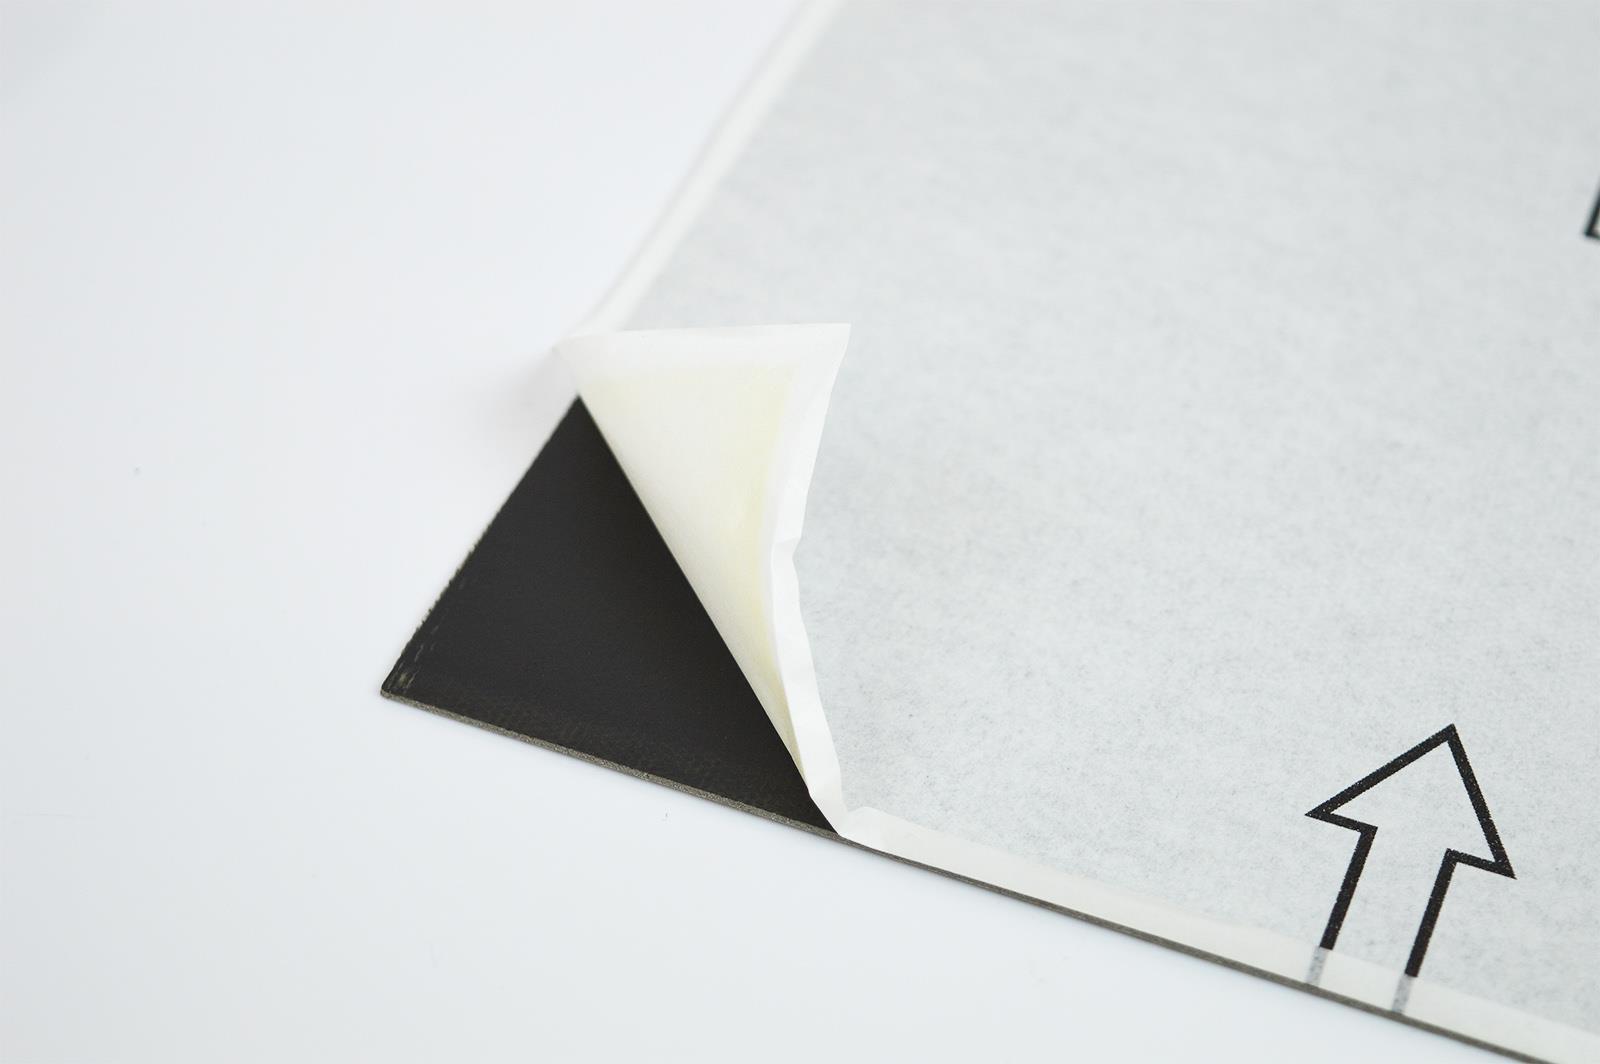 Floor-Tiles-Self-Adhesive-Vinyl-Flooring-Kitchen-Bathroom-Brown-Wood-Grain thumbnail 15